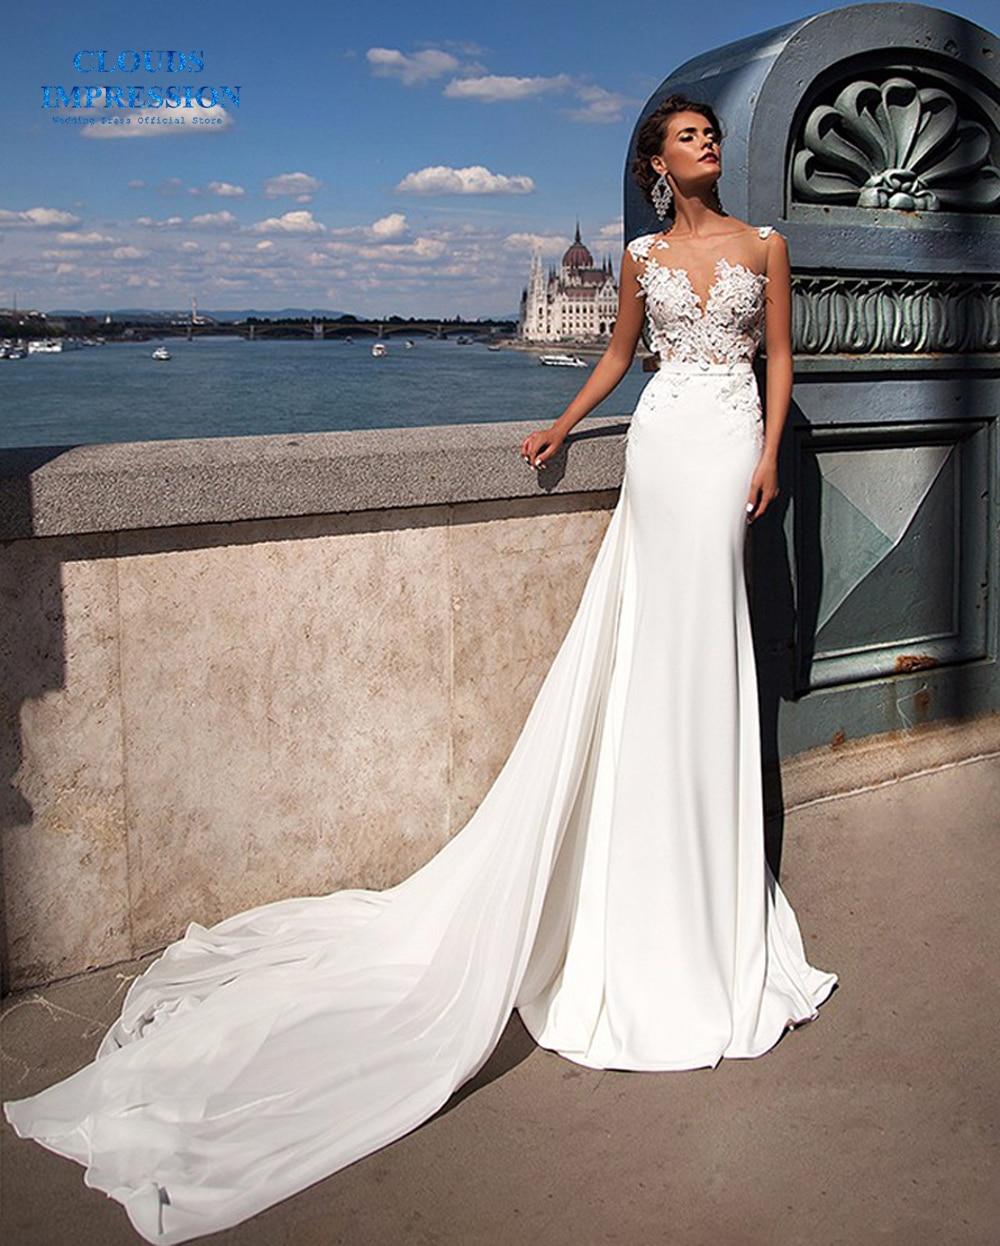 Trumpet Wedding Dresses 2019: CLOUDS IMPRESSION Luxury Mermaid Wedding Dresses 2019 With